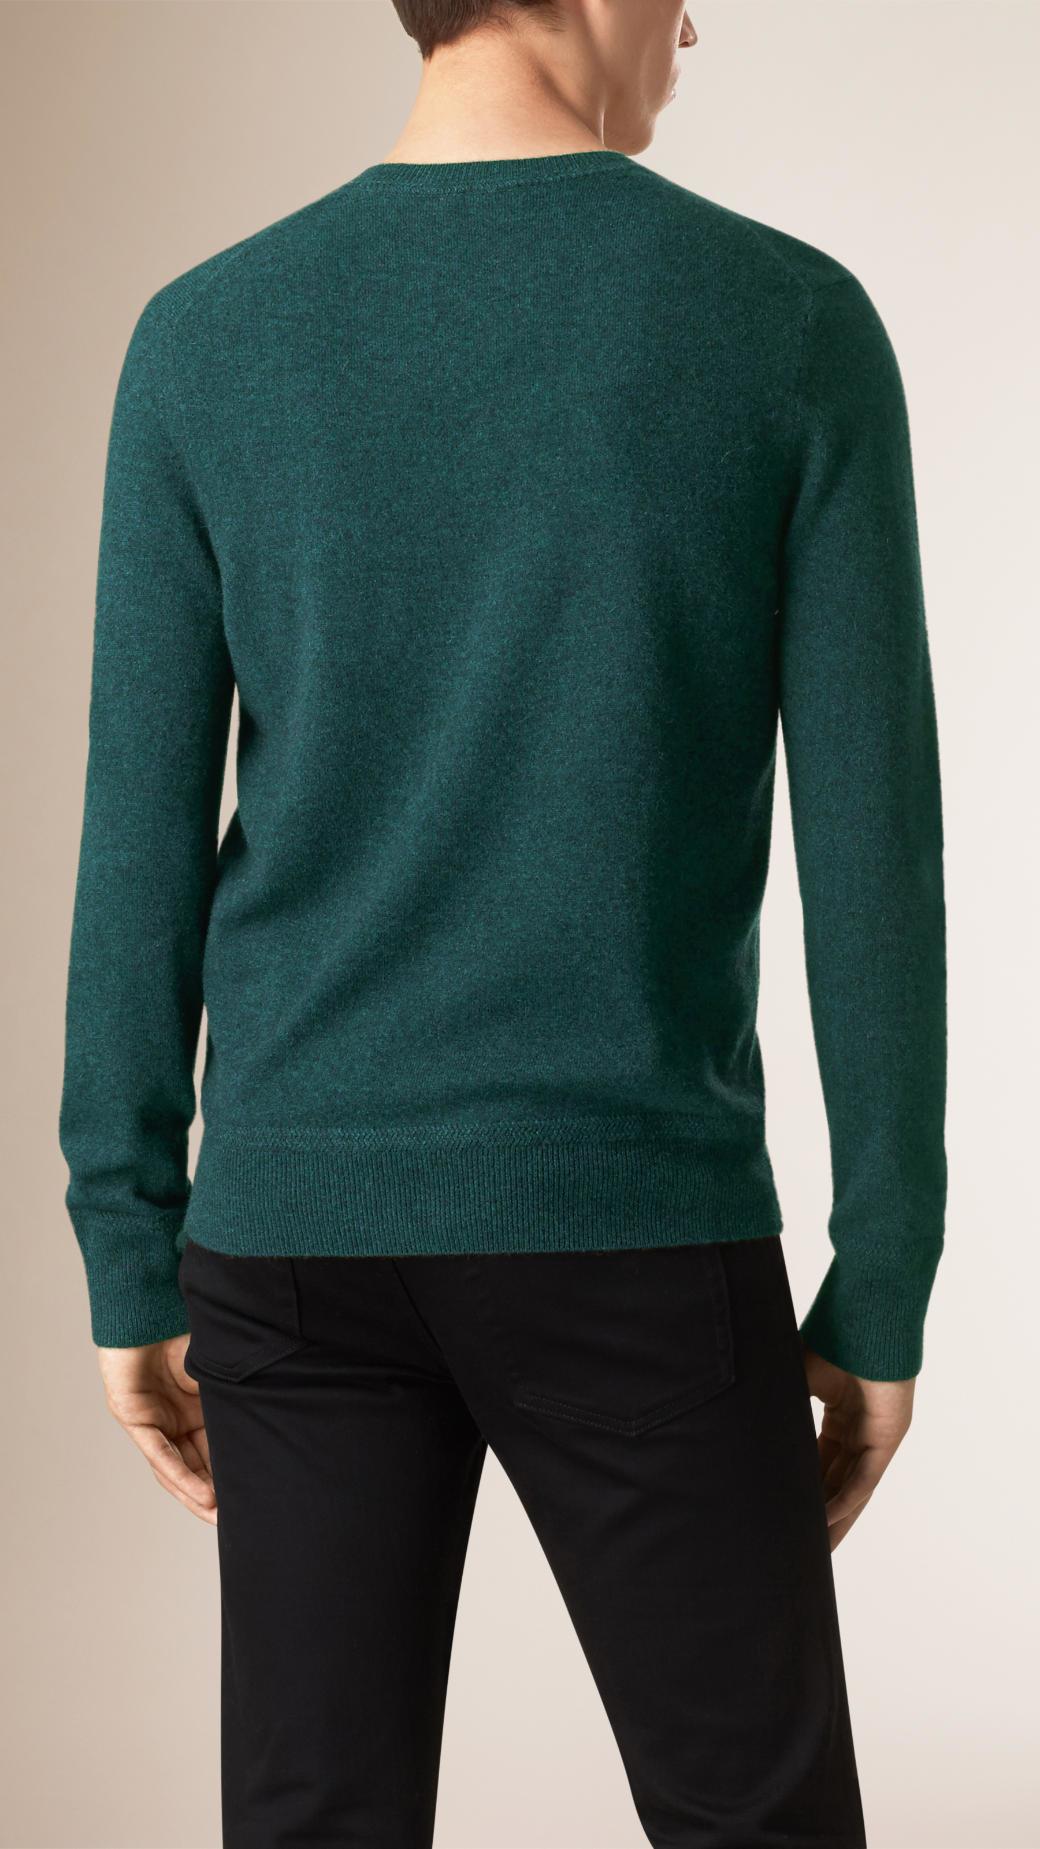 Kenzo Sweater Men